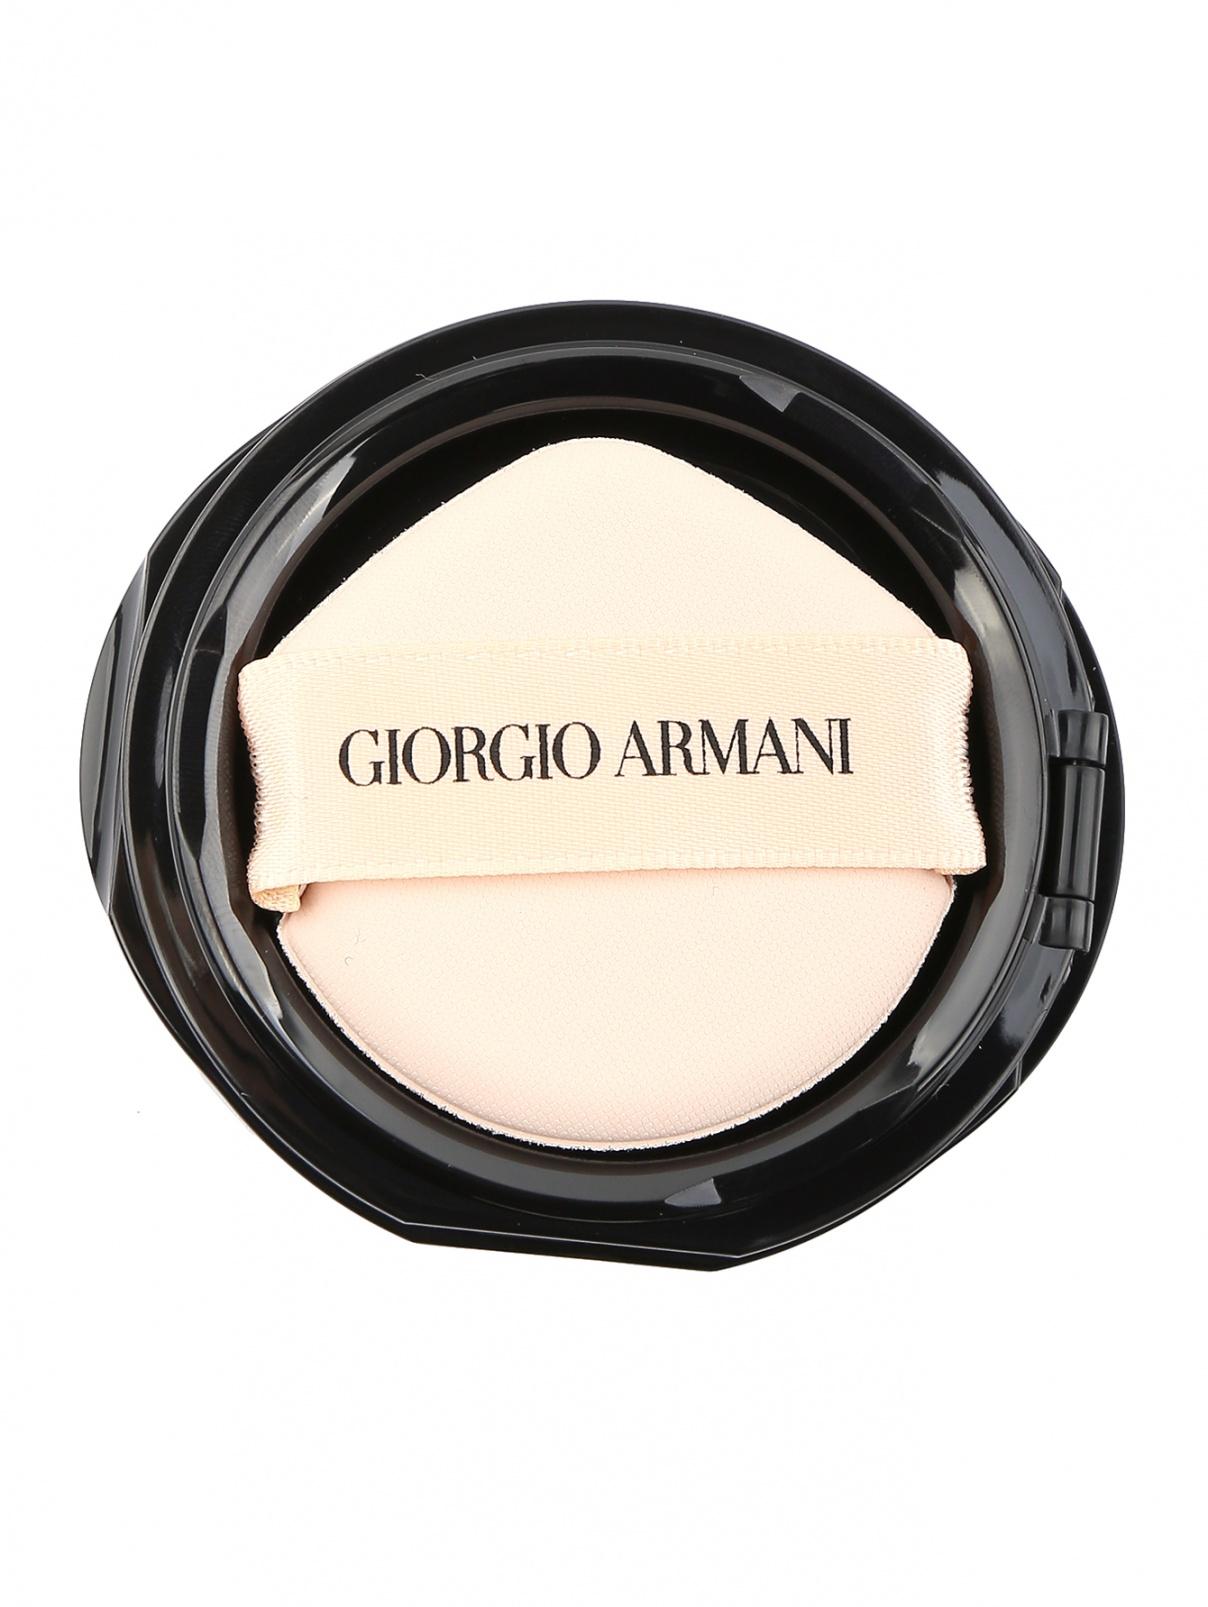 Кушон сменный блок 5.5 Armani to go Giorgio Armani  –  Общий вид